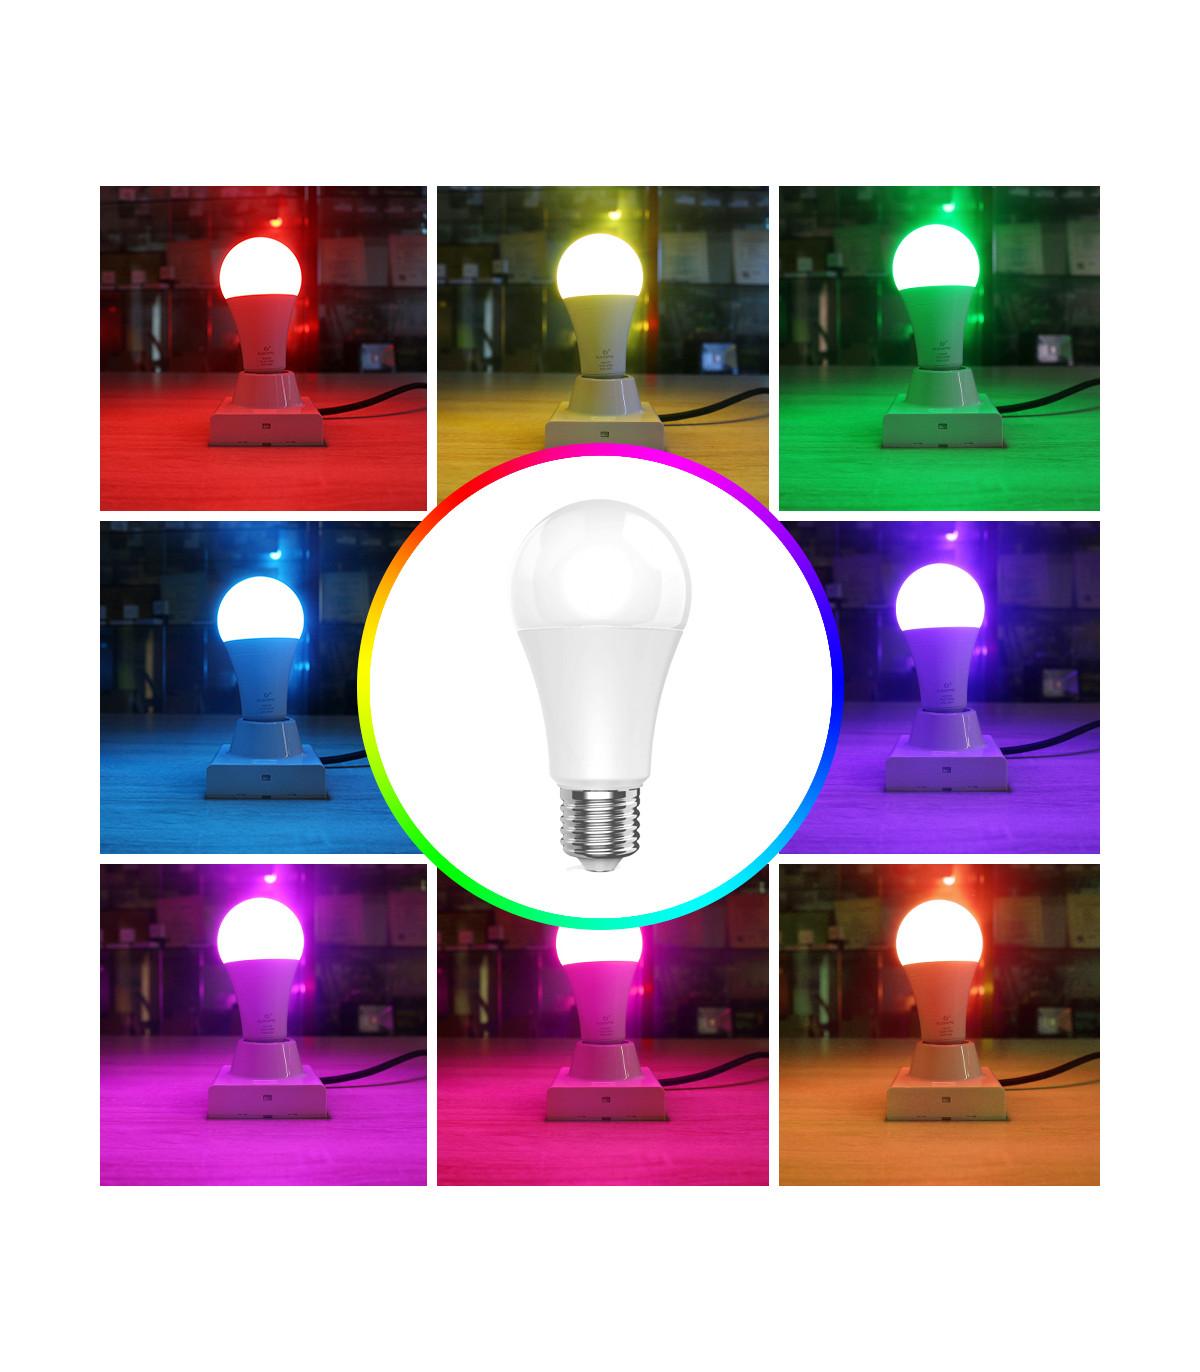 Żarówka RGB LED ZigBee 10W E27 TUYA Hue